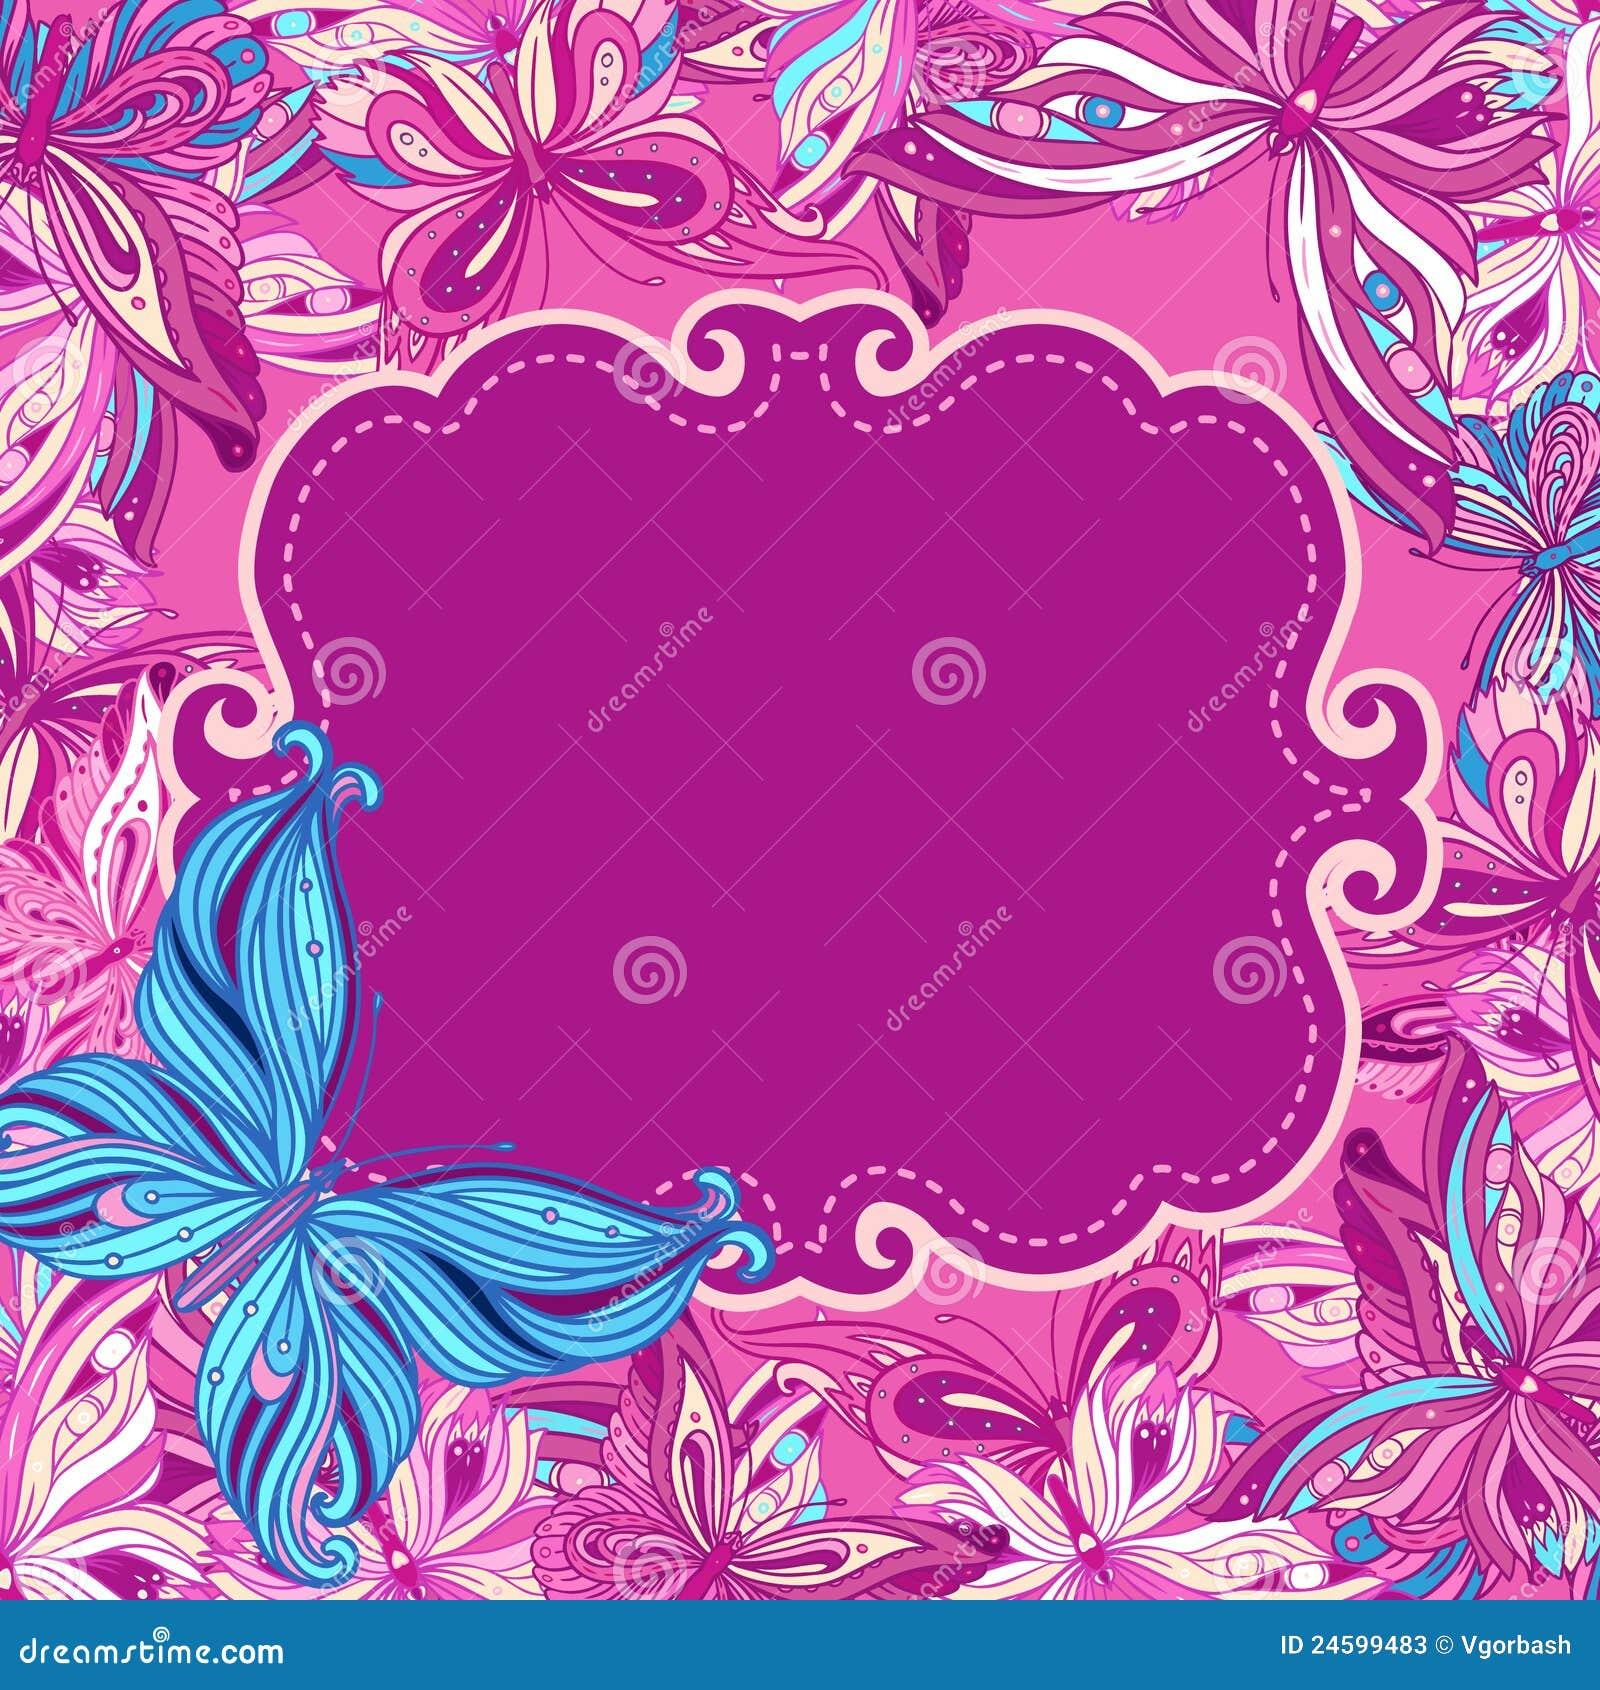 Butterflies Background Design Stock Photos - Image: 24599483